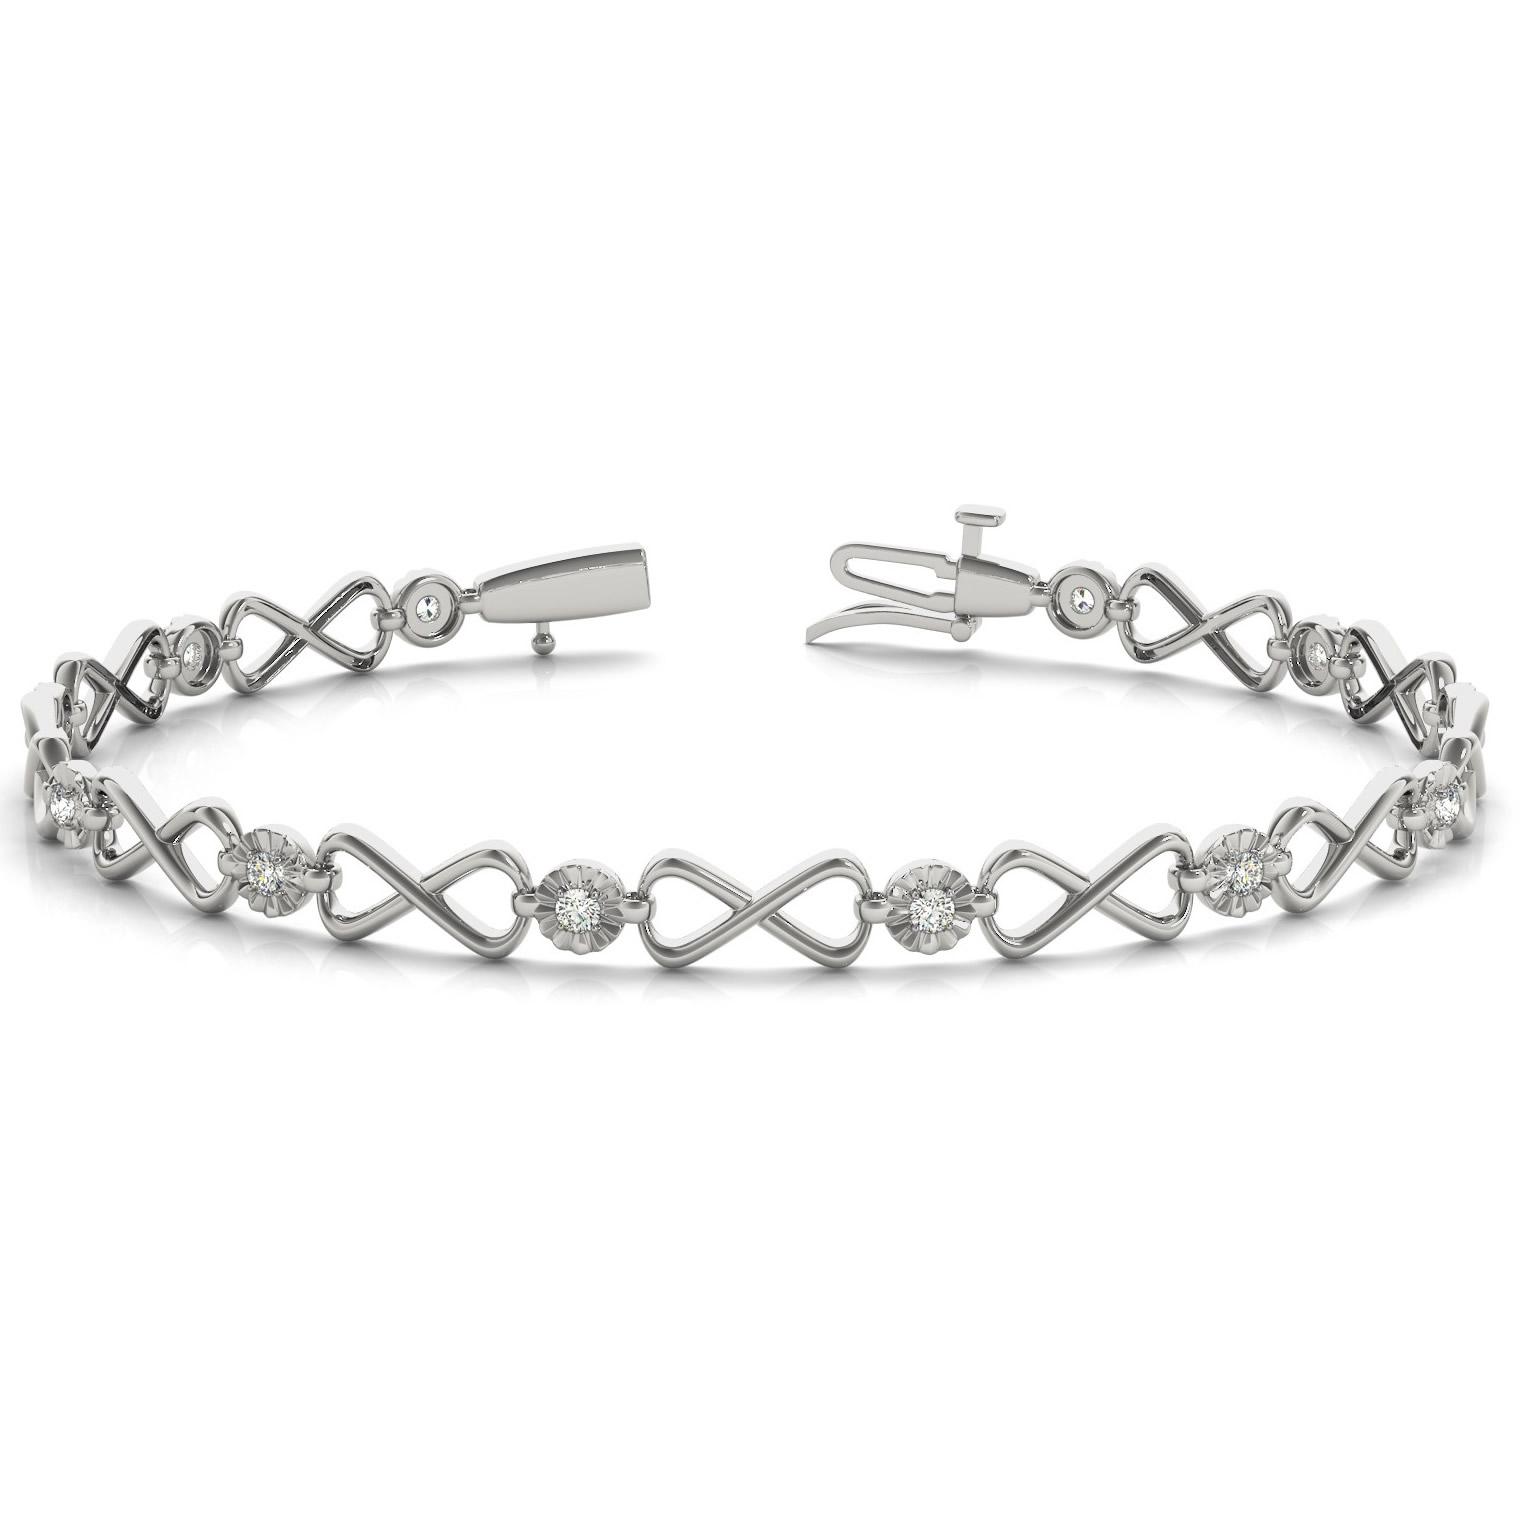 1/4 Carat TW Diamond Infinity Bracelet in 10K White Gold